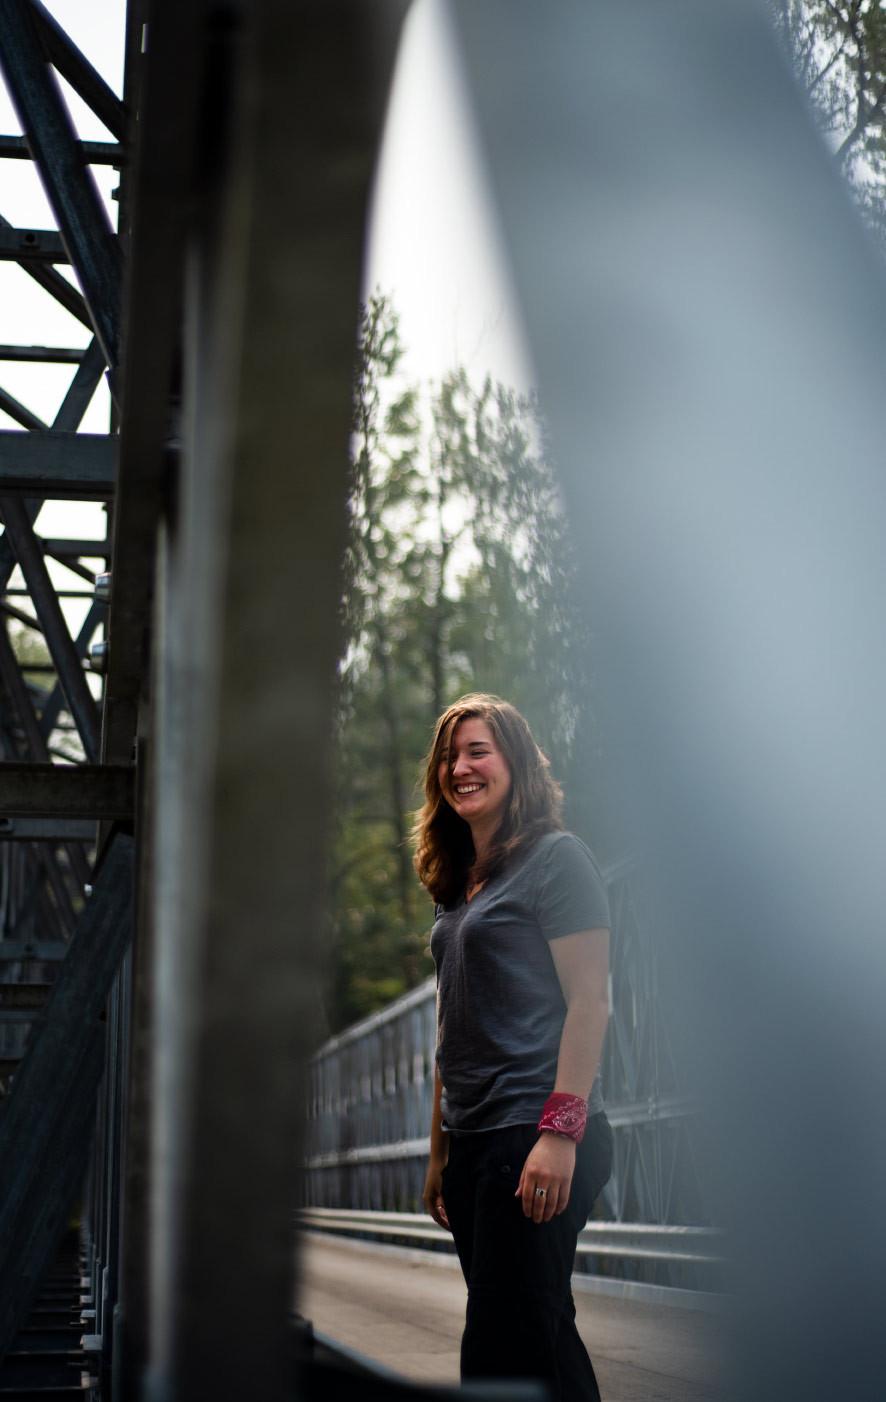 Sam smiling on bridge